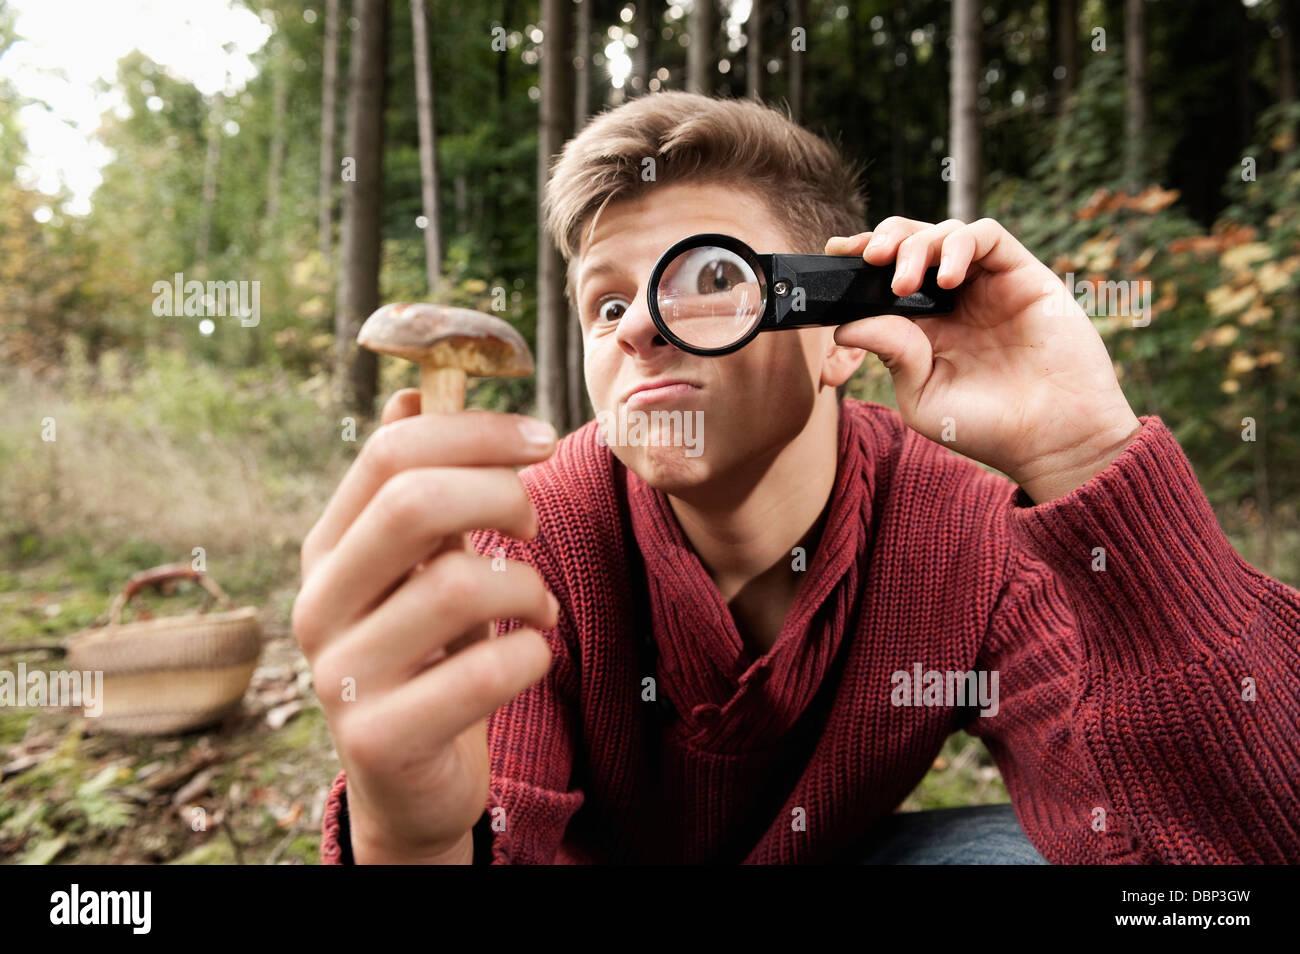 Teenage boy looking at mushroom through magnifying glass, Bavaria, Germany, Europe - Stock Image